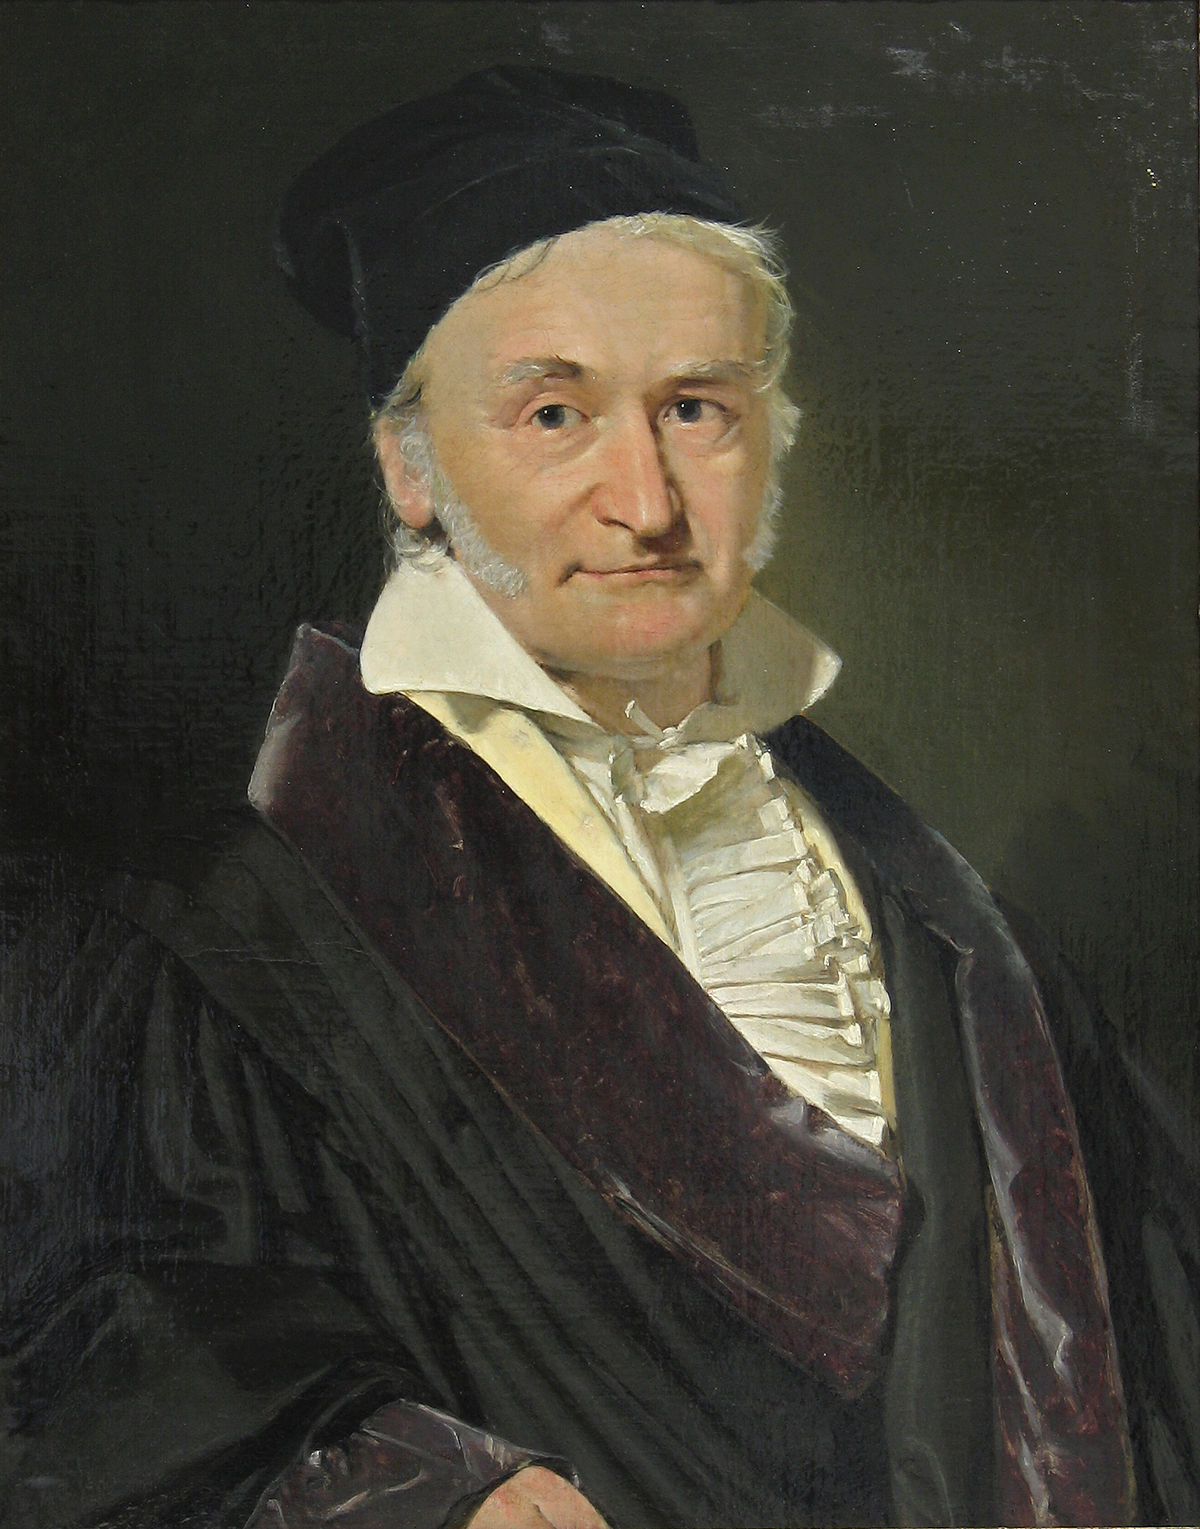 Carl Friedrich Gauss 1840 by Jensen.jpg